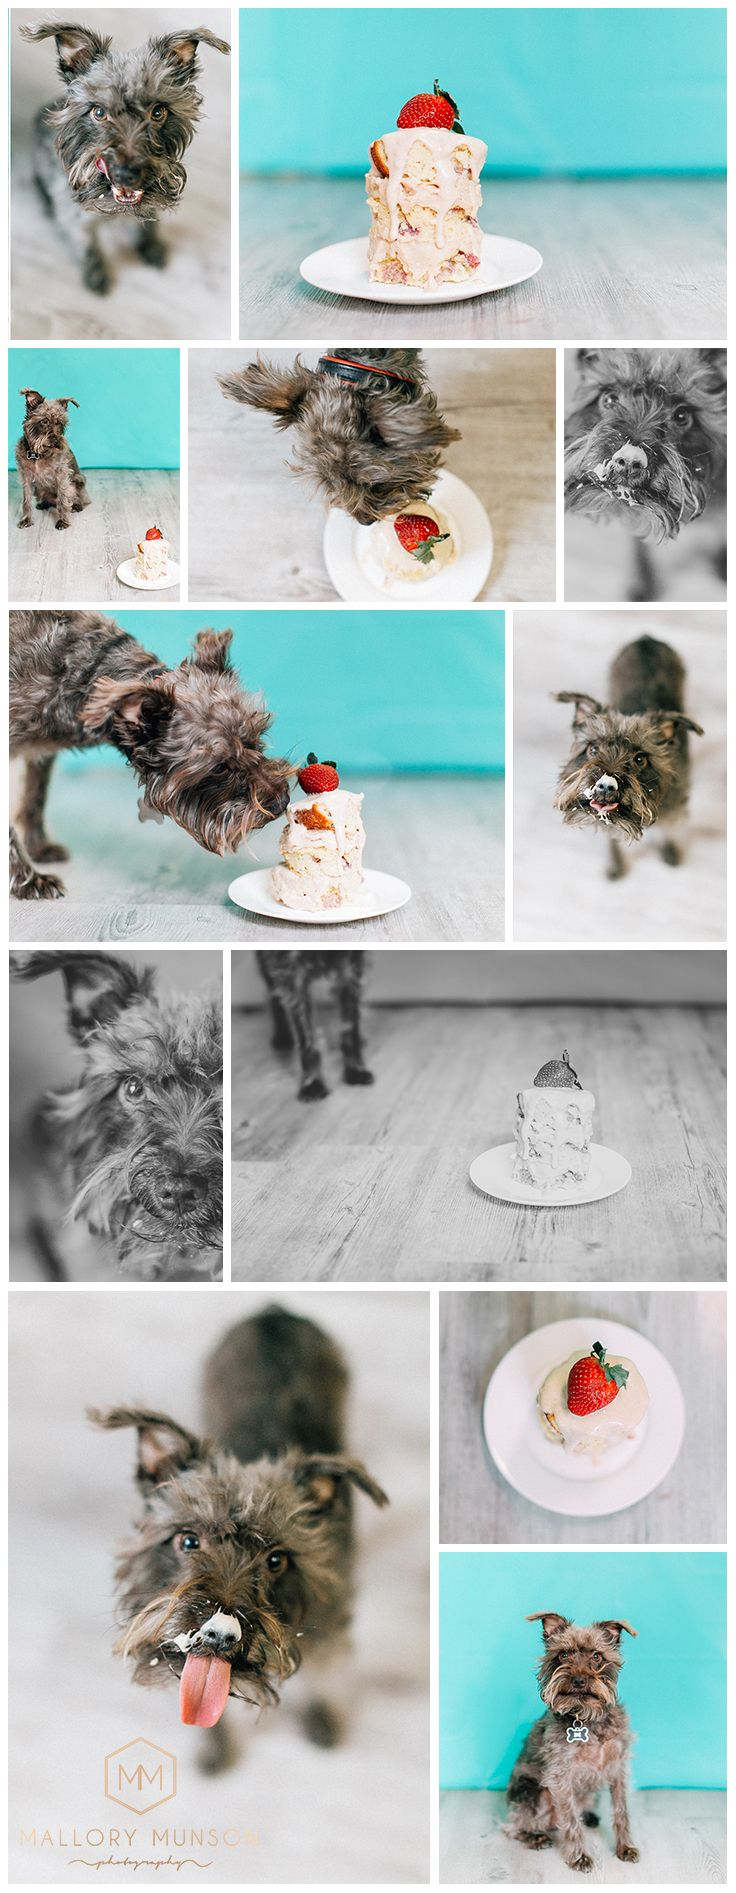 Our Miniature Schnauzer Jasper's third birthday! A homemade dog friendly cake and a photo shoot.